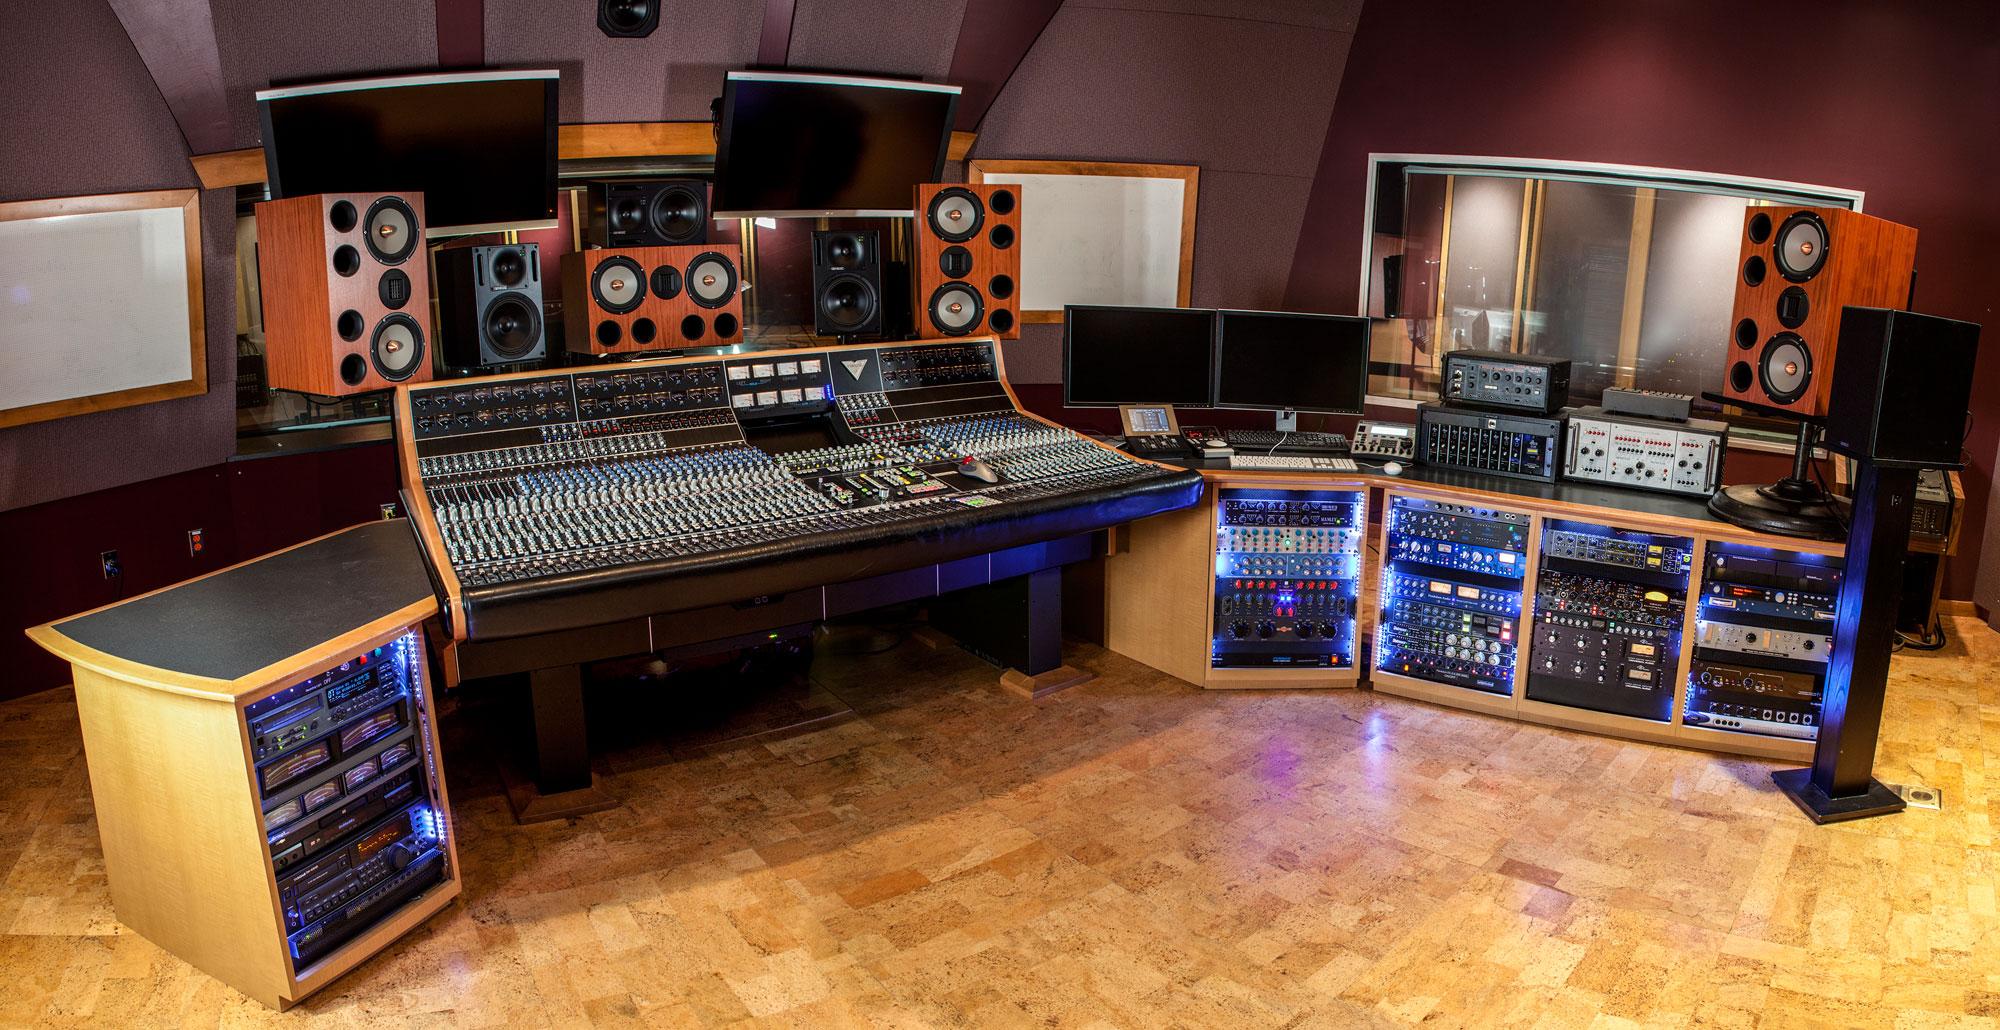 Sound Studio Design | Joy Studio Design Gallery - Best Design - photo#32